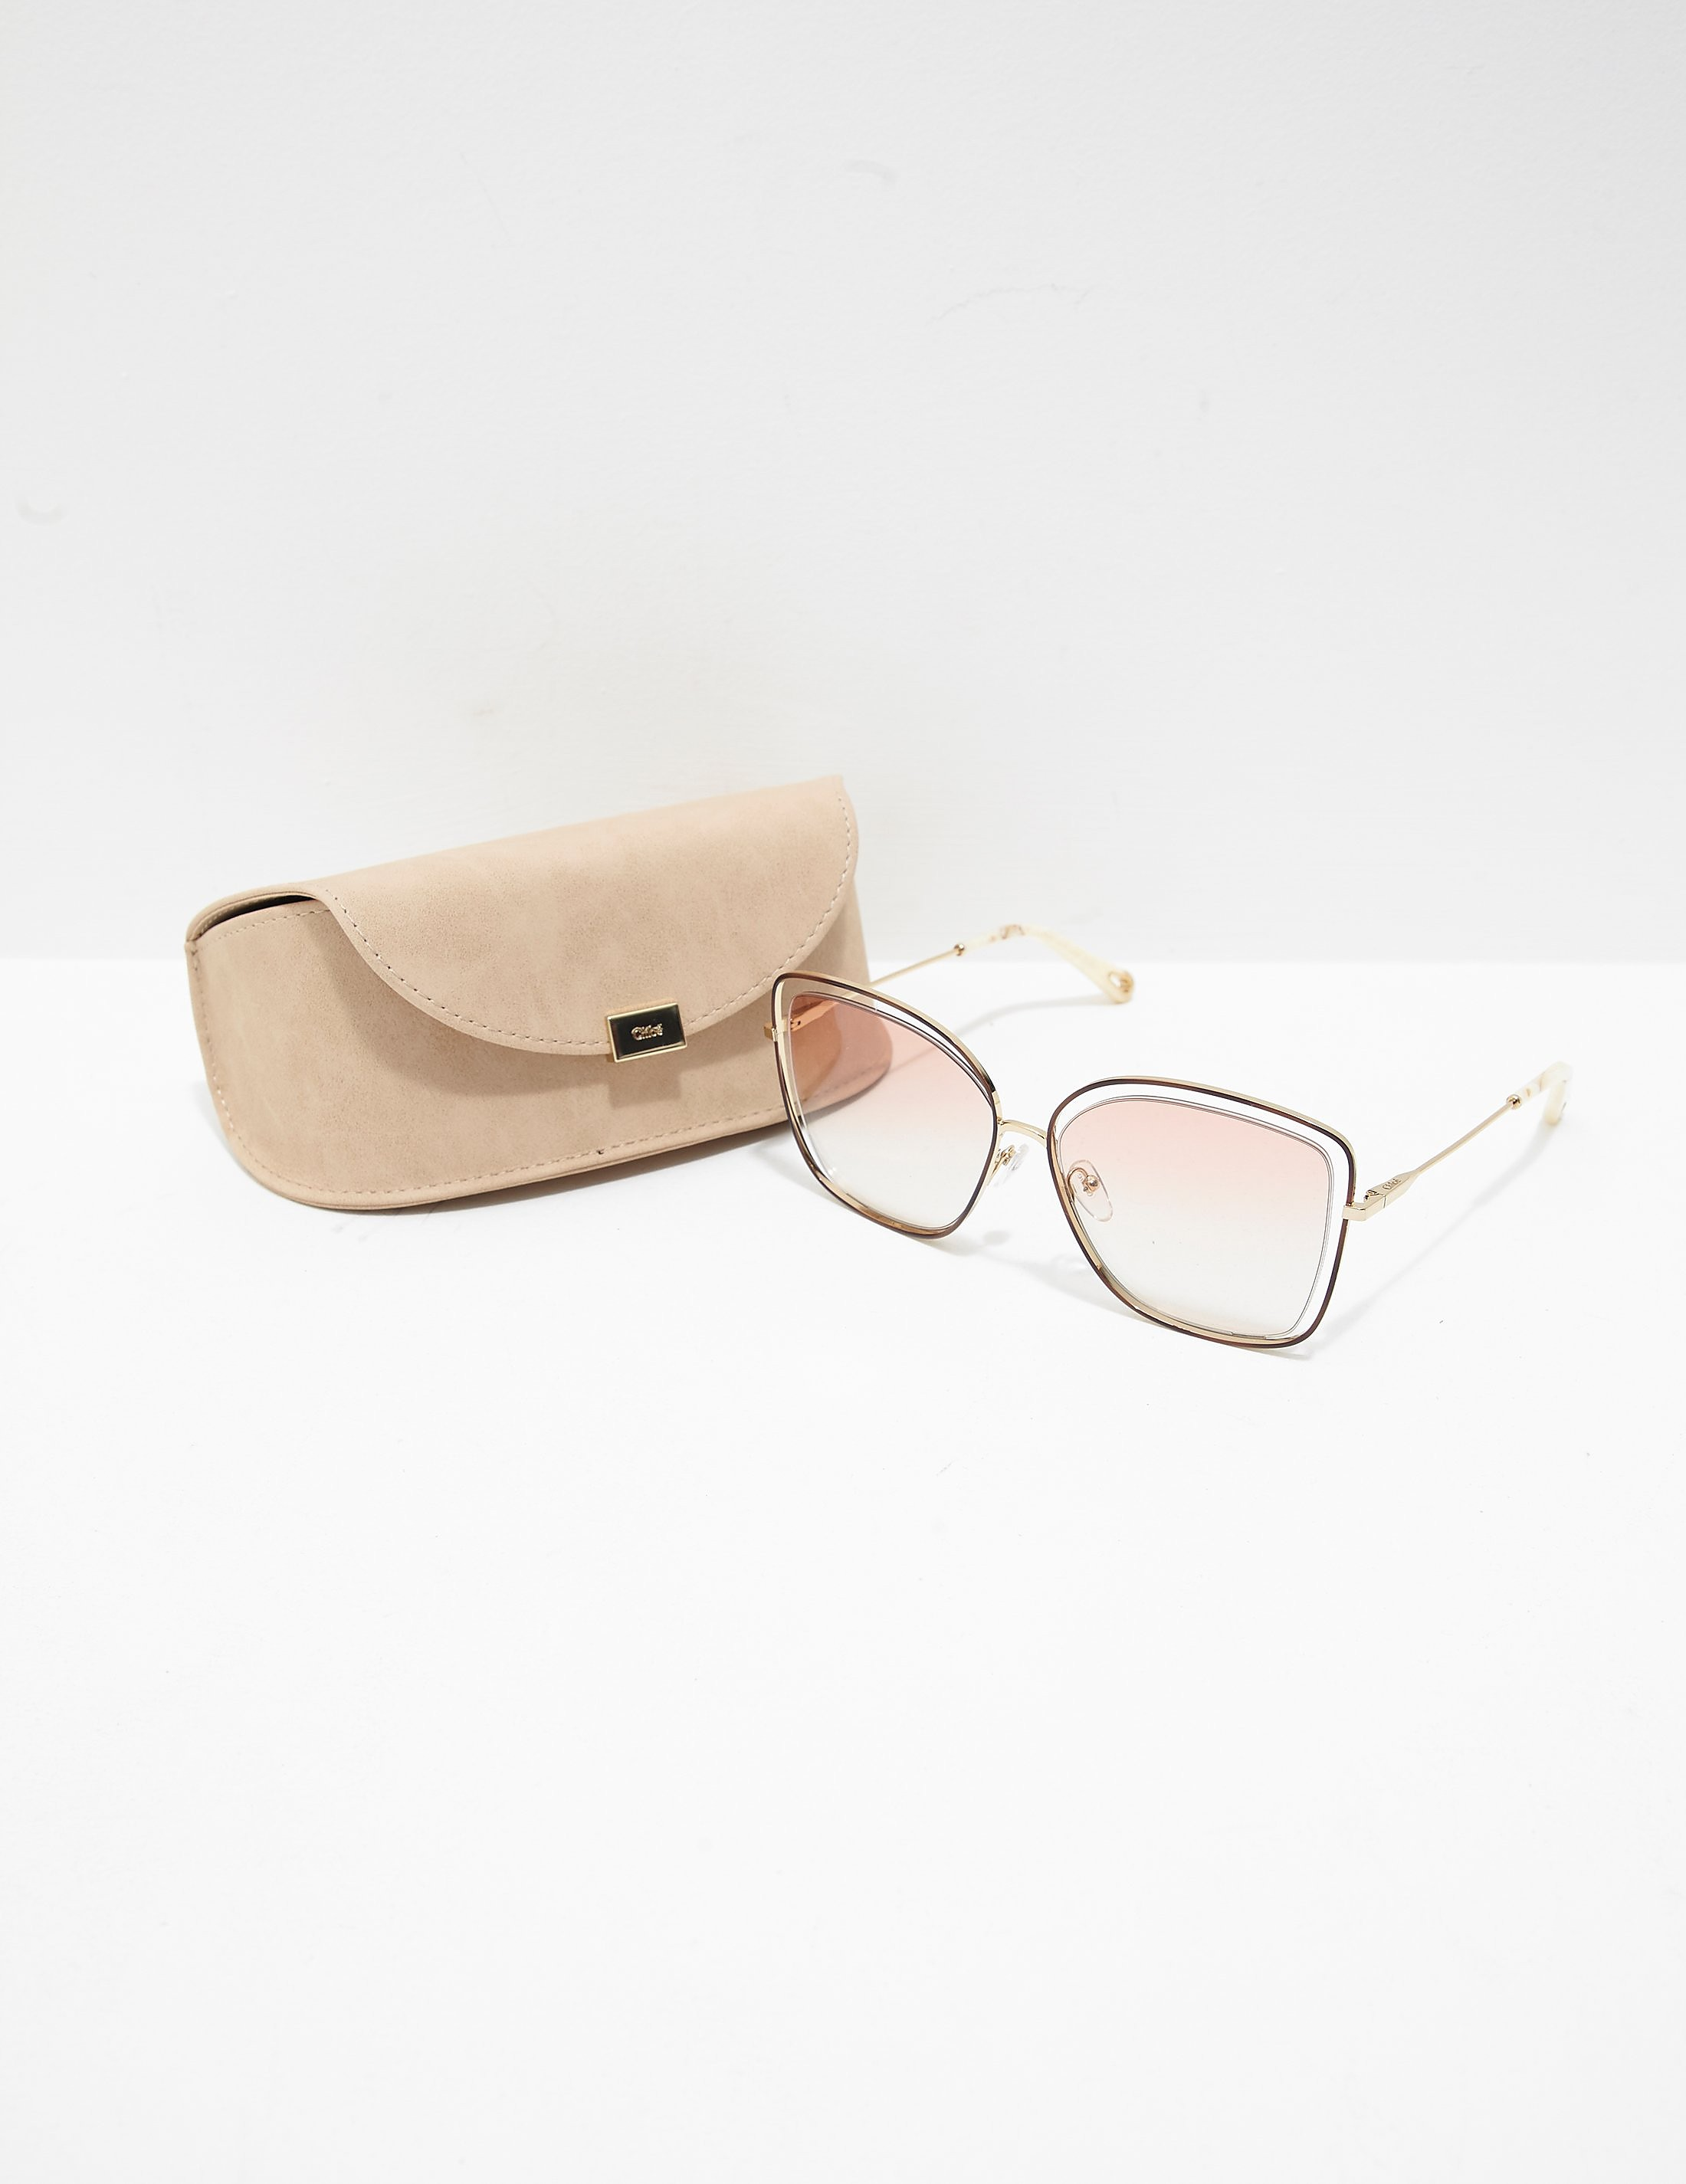 Chloe Square Metal Sunglasses - Online Exclusive